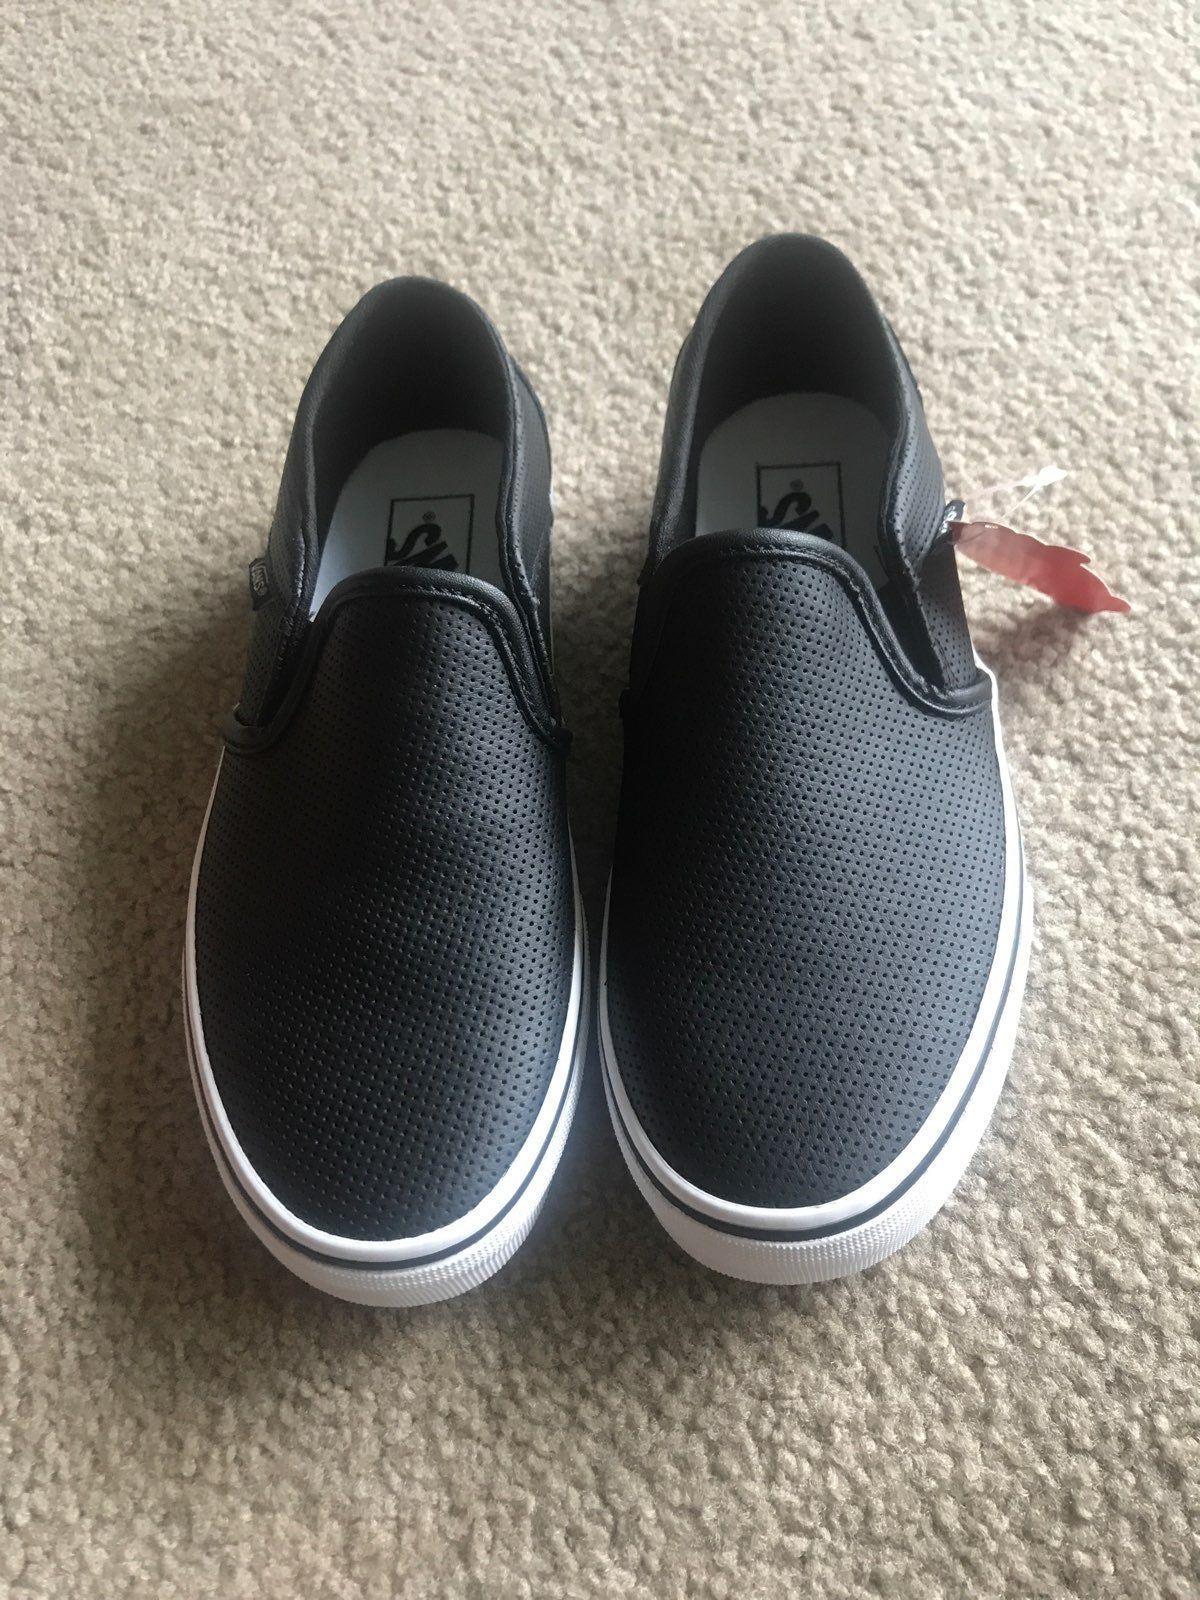 Black leather slip on vans size 7 in